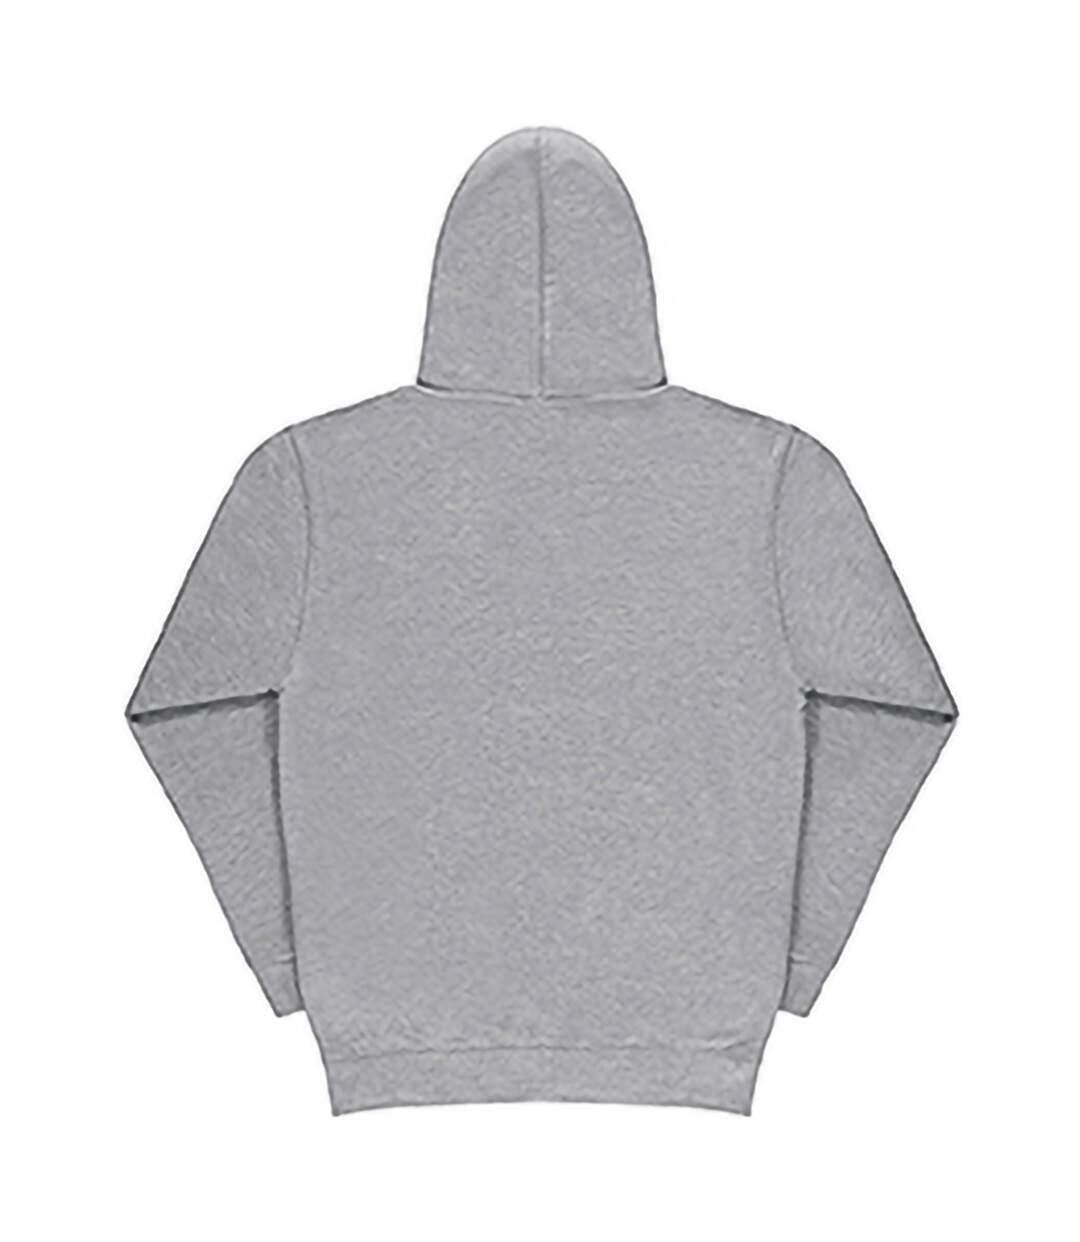 SG Mens Plain Hooded Sweatshirt Top / Hoodie (Light Oxford) - UTBC1072